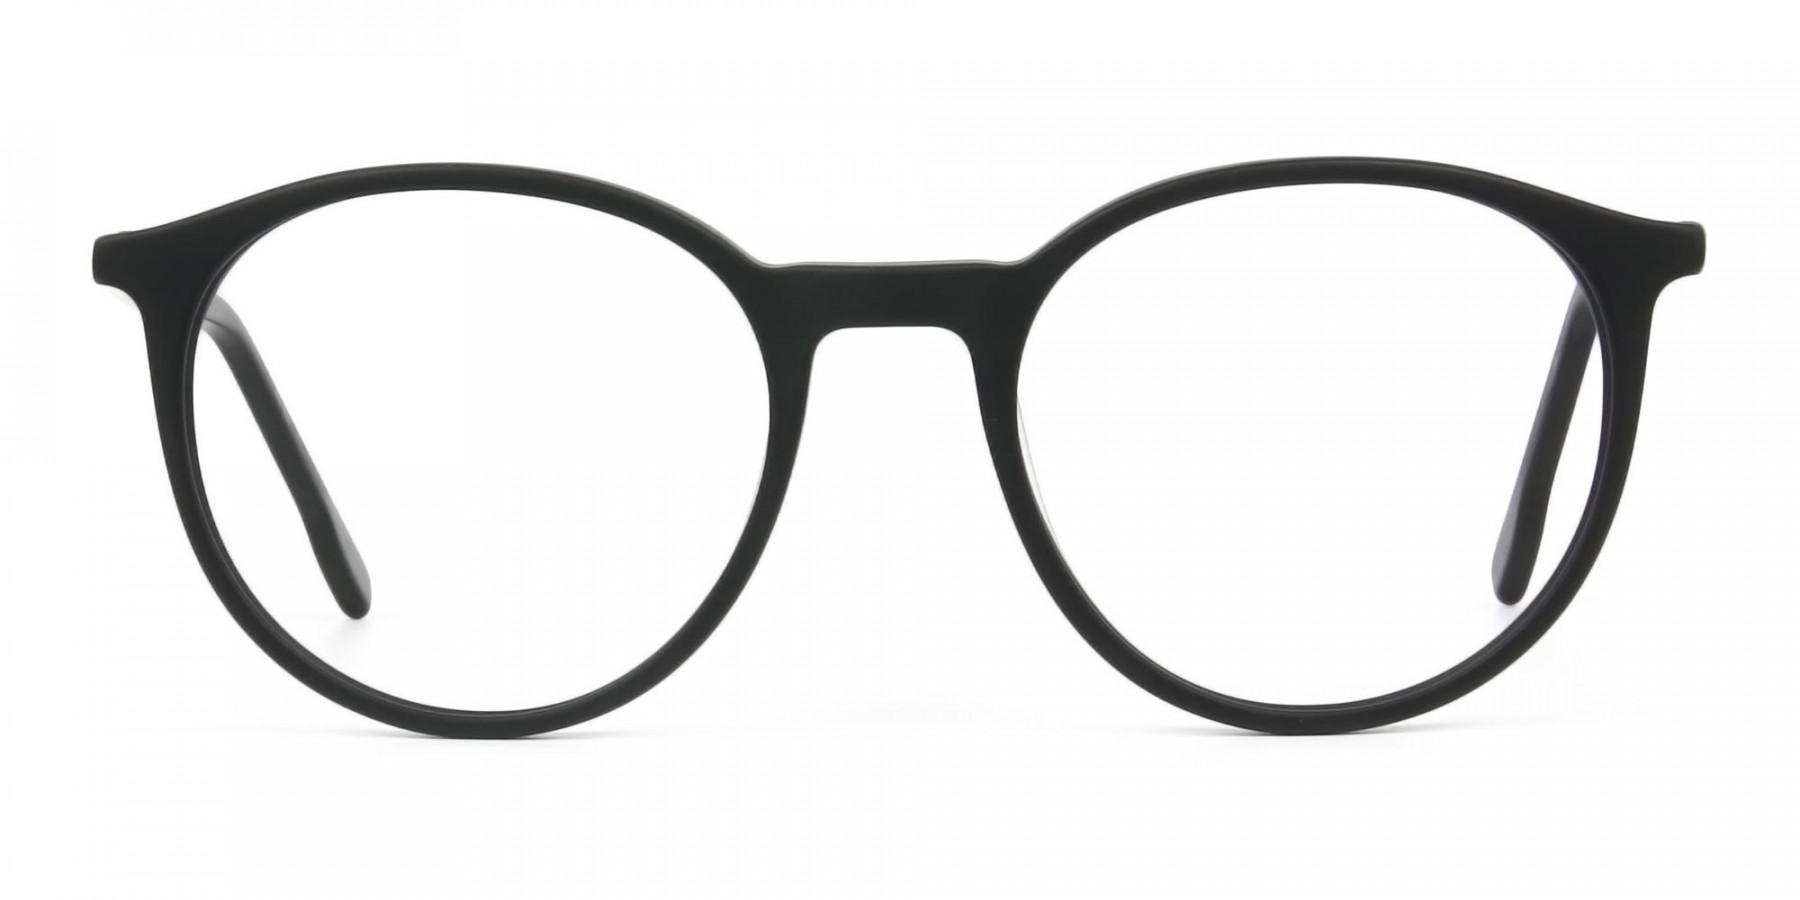 Designer Matte Black Acetate Eyeglasses in Round - 1